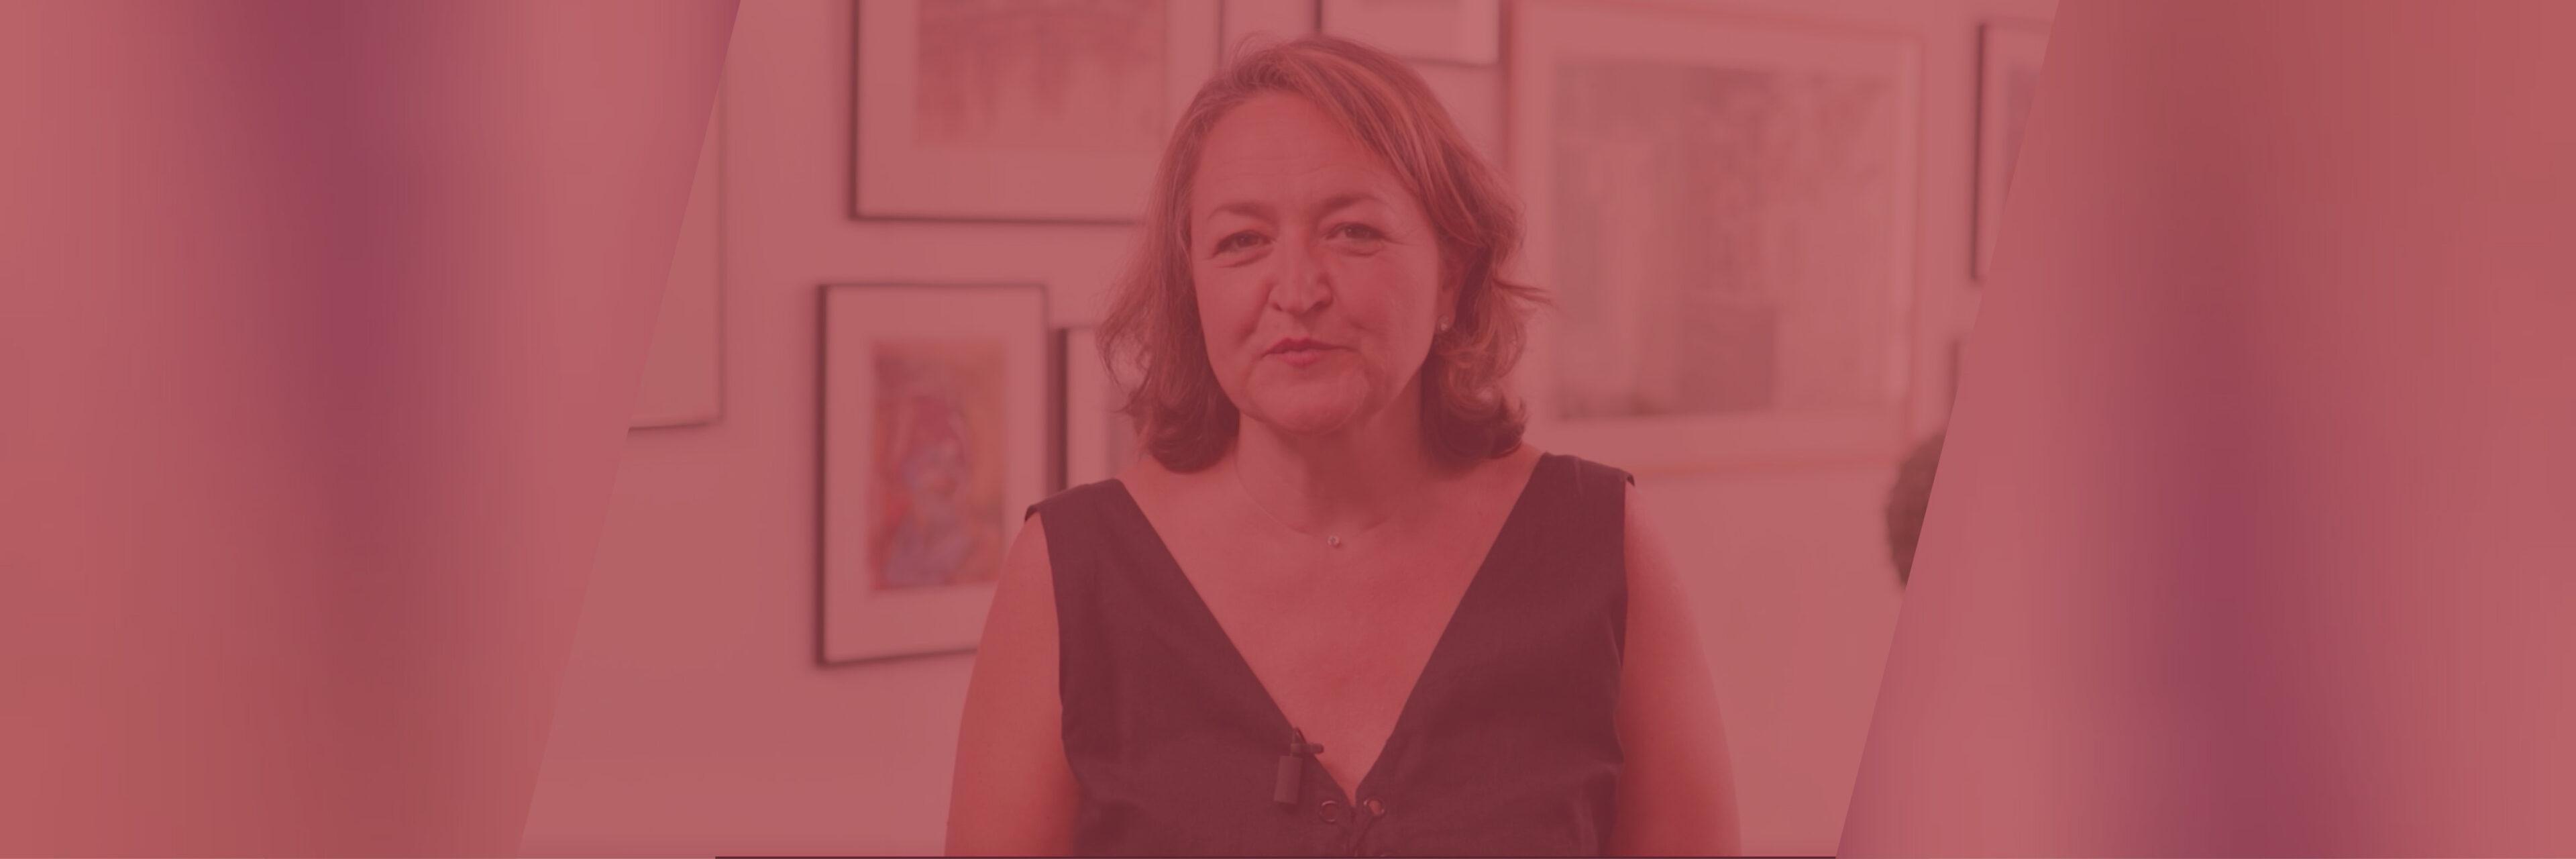 Idées reçues n°6 : procédures collectives - Me Anne Bolland-Blanchard